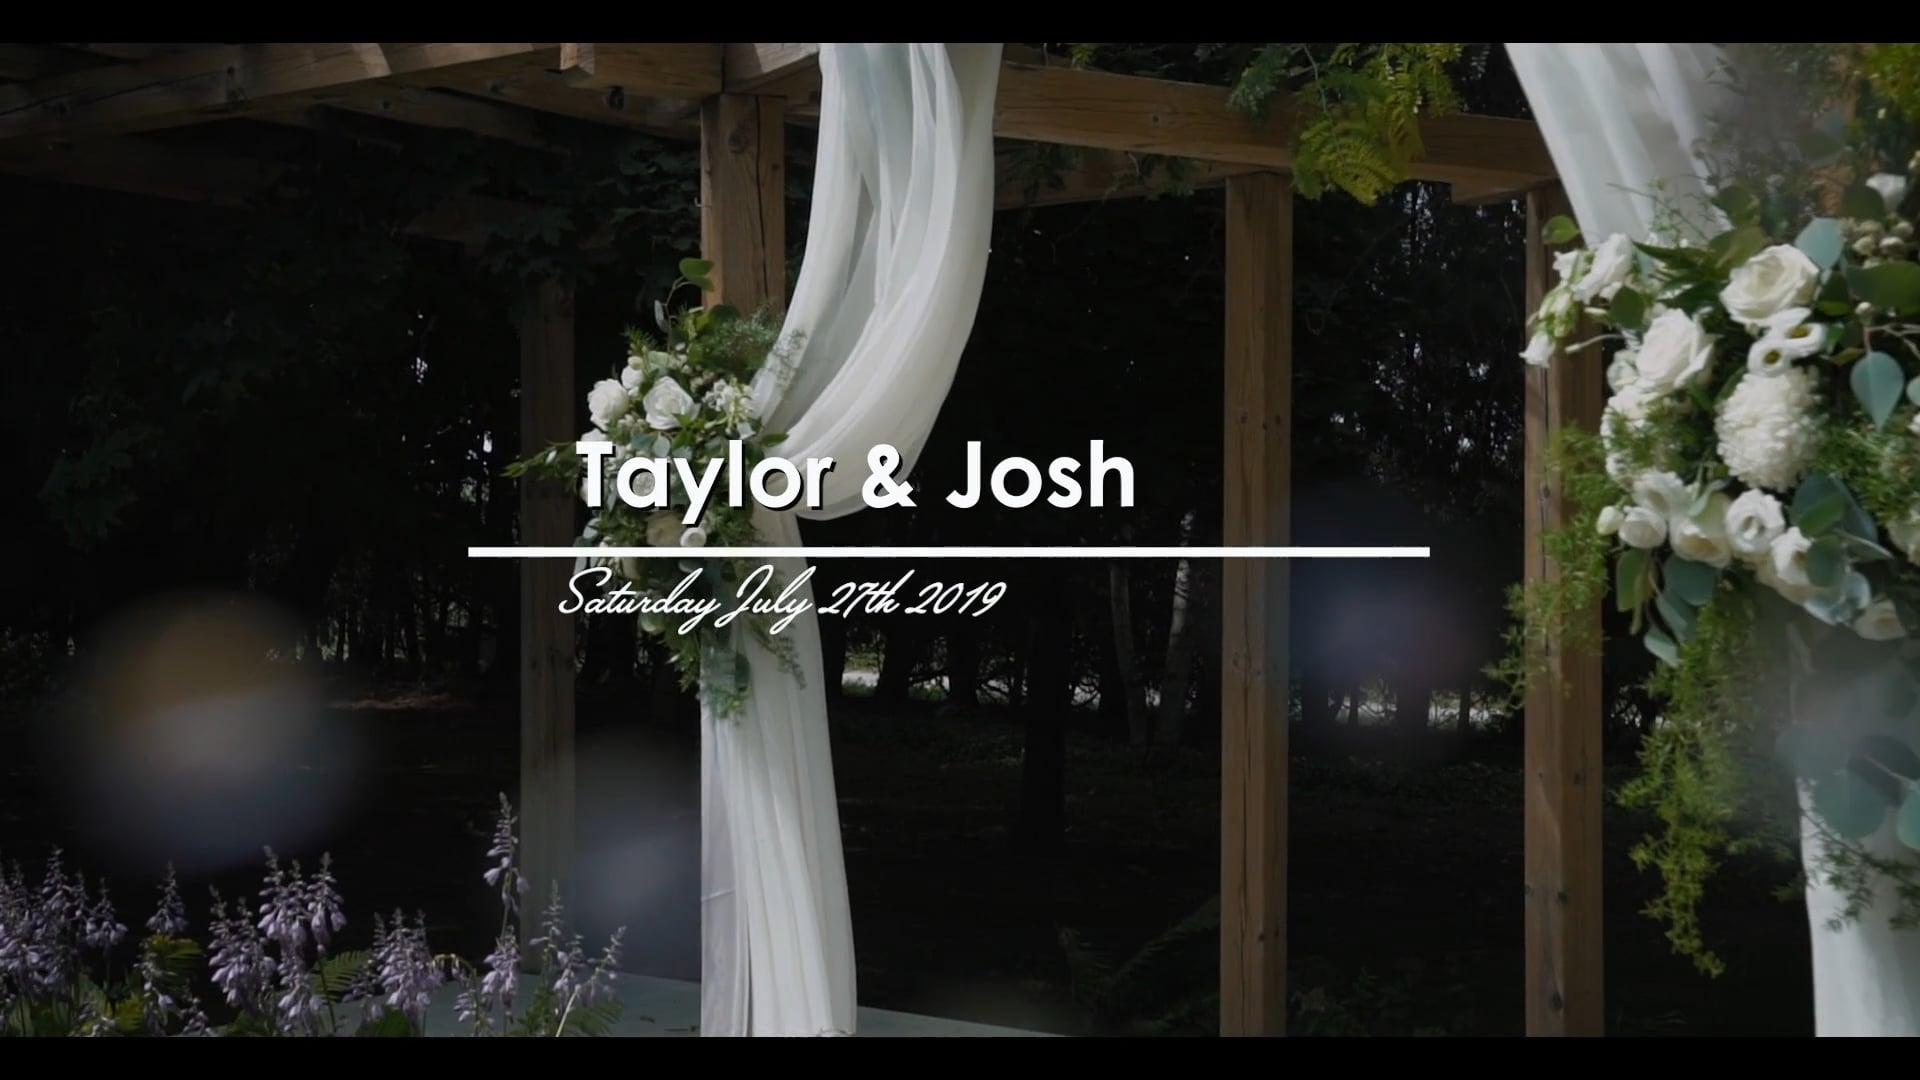 Feith wedding